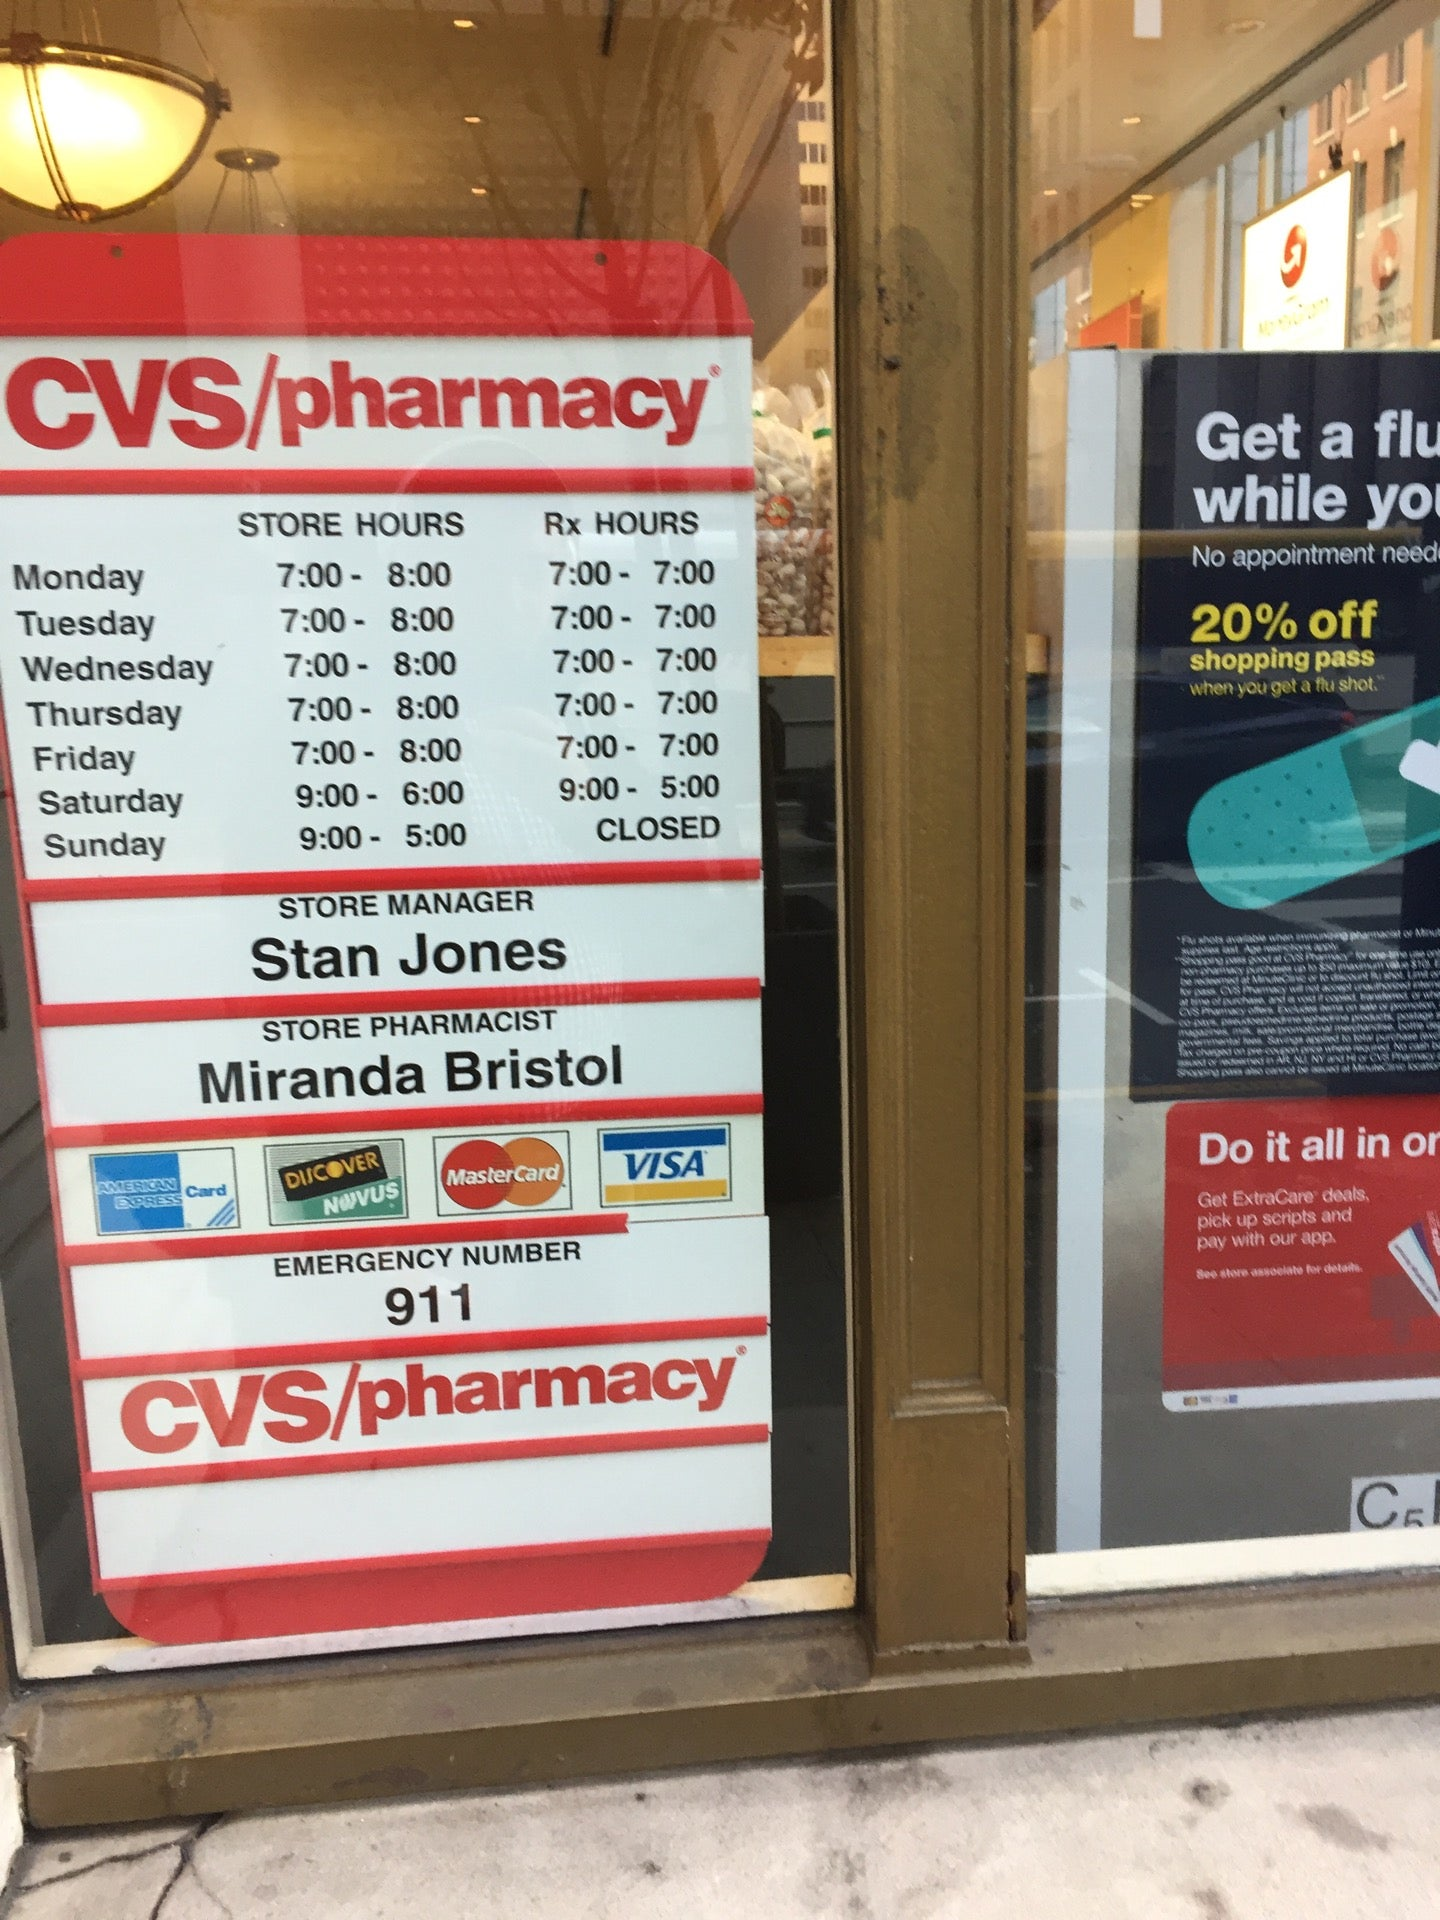 CVS/pharmacy in San Francisco - Parent Reviews on Winnie